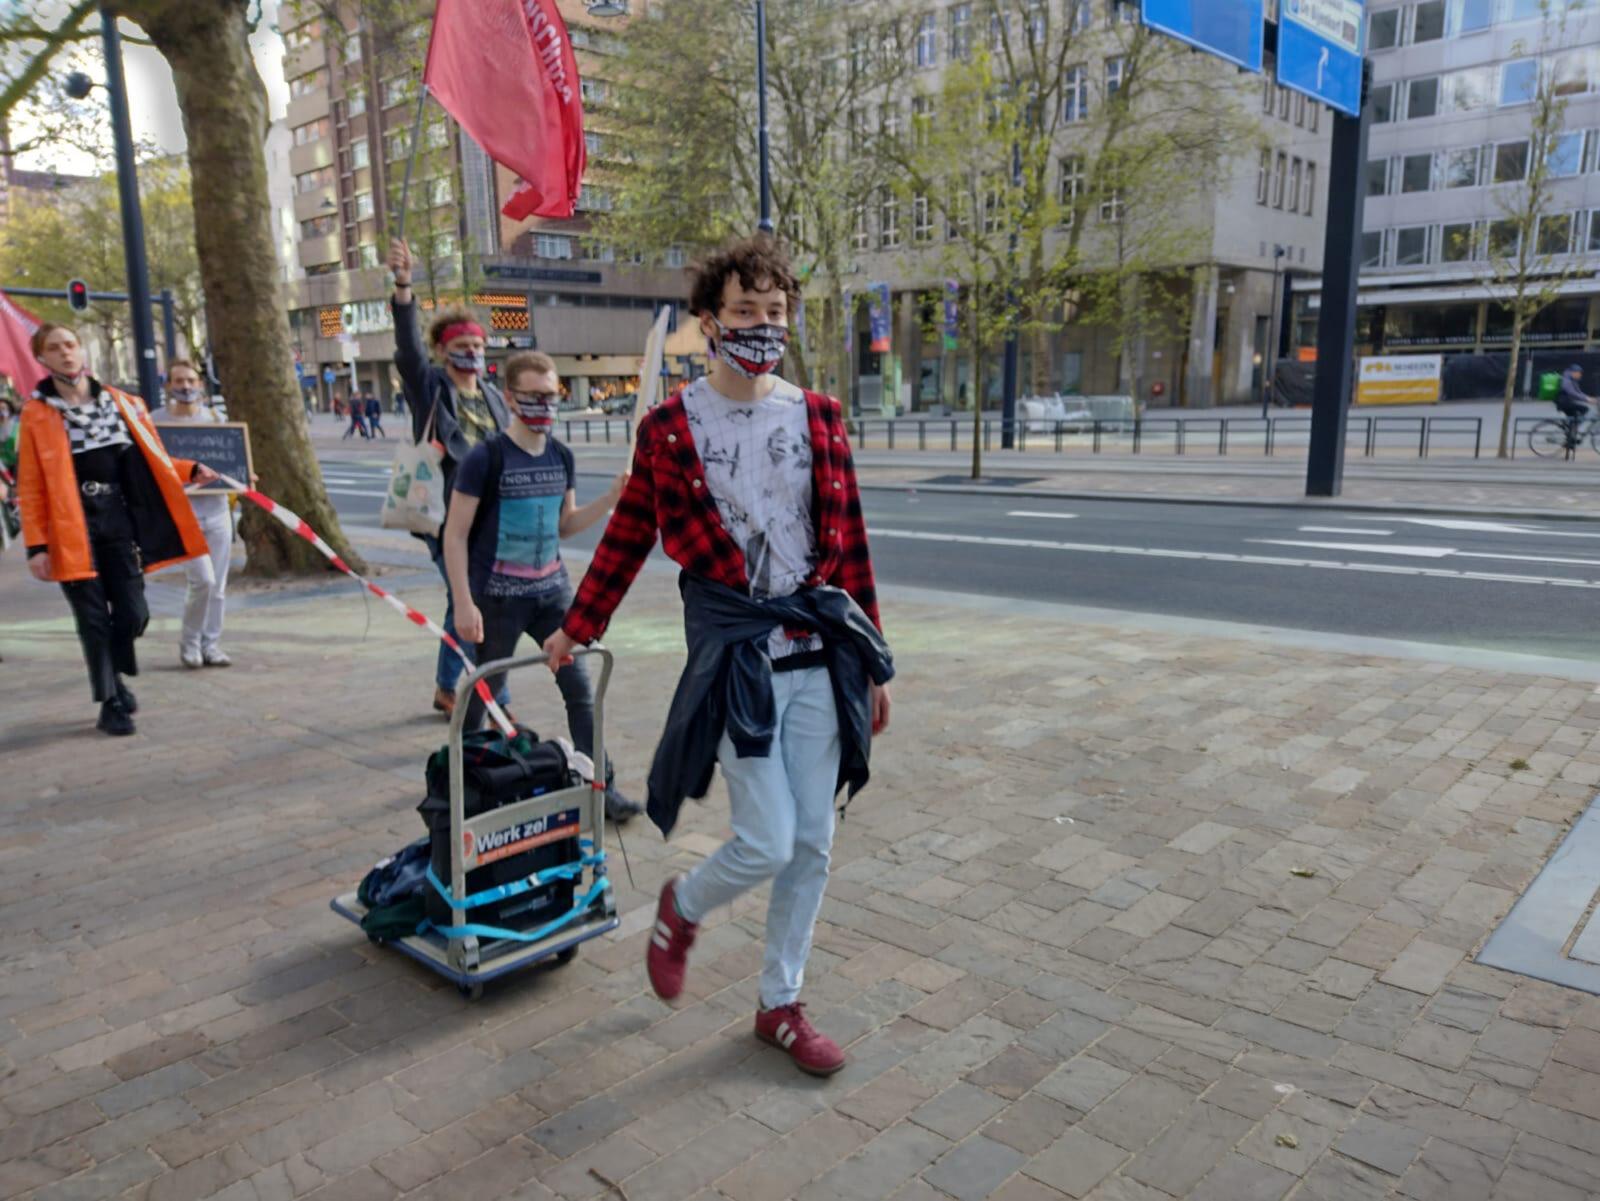 protest leenstelsel rotterdam 19-05-2021